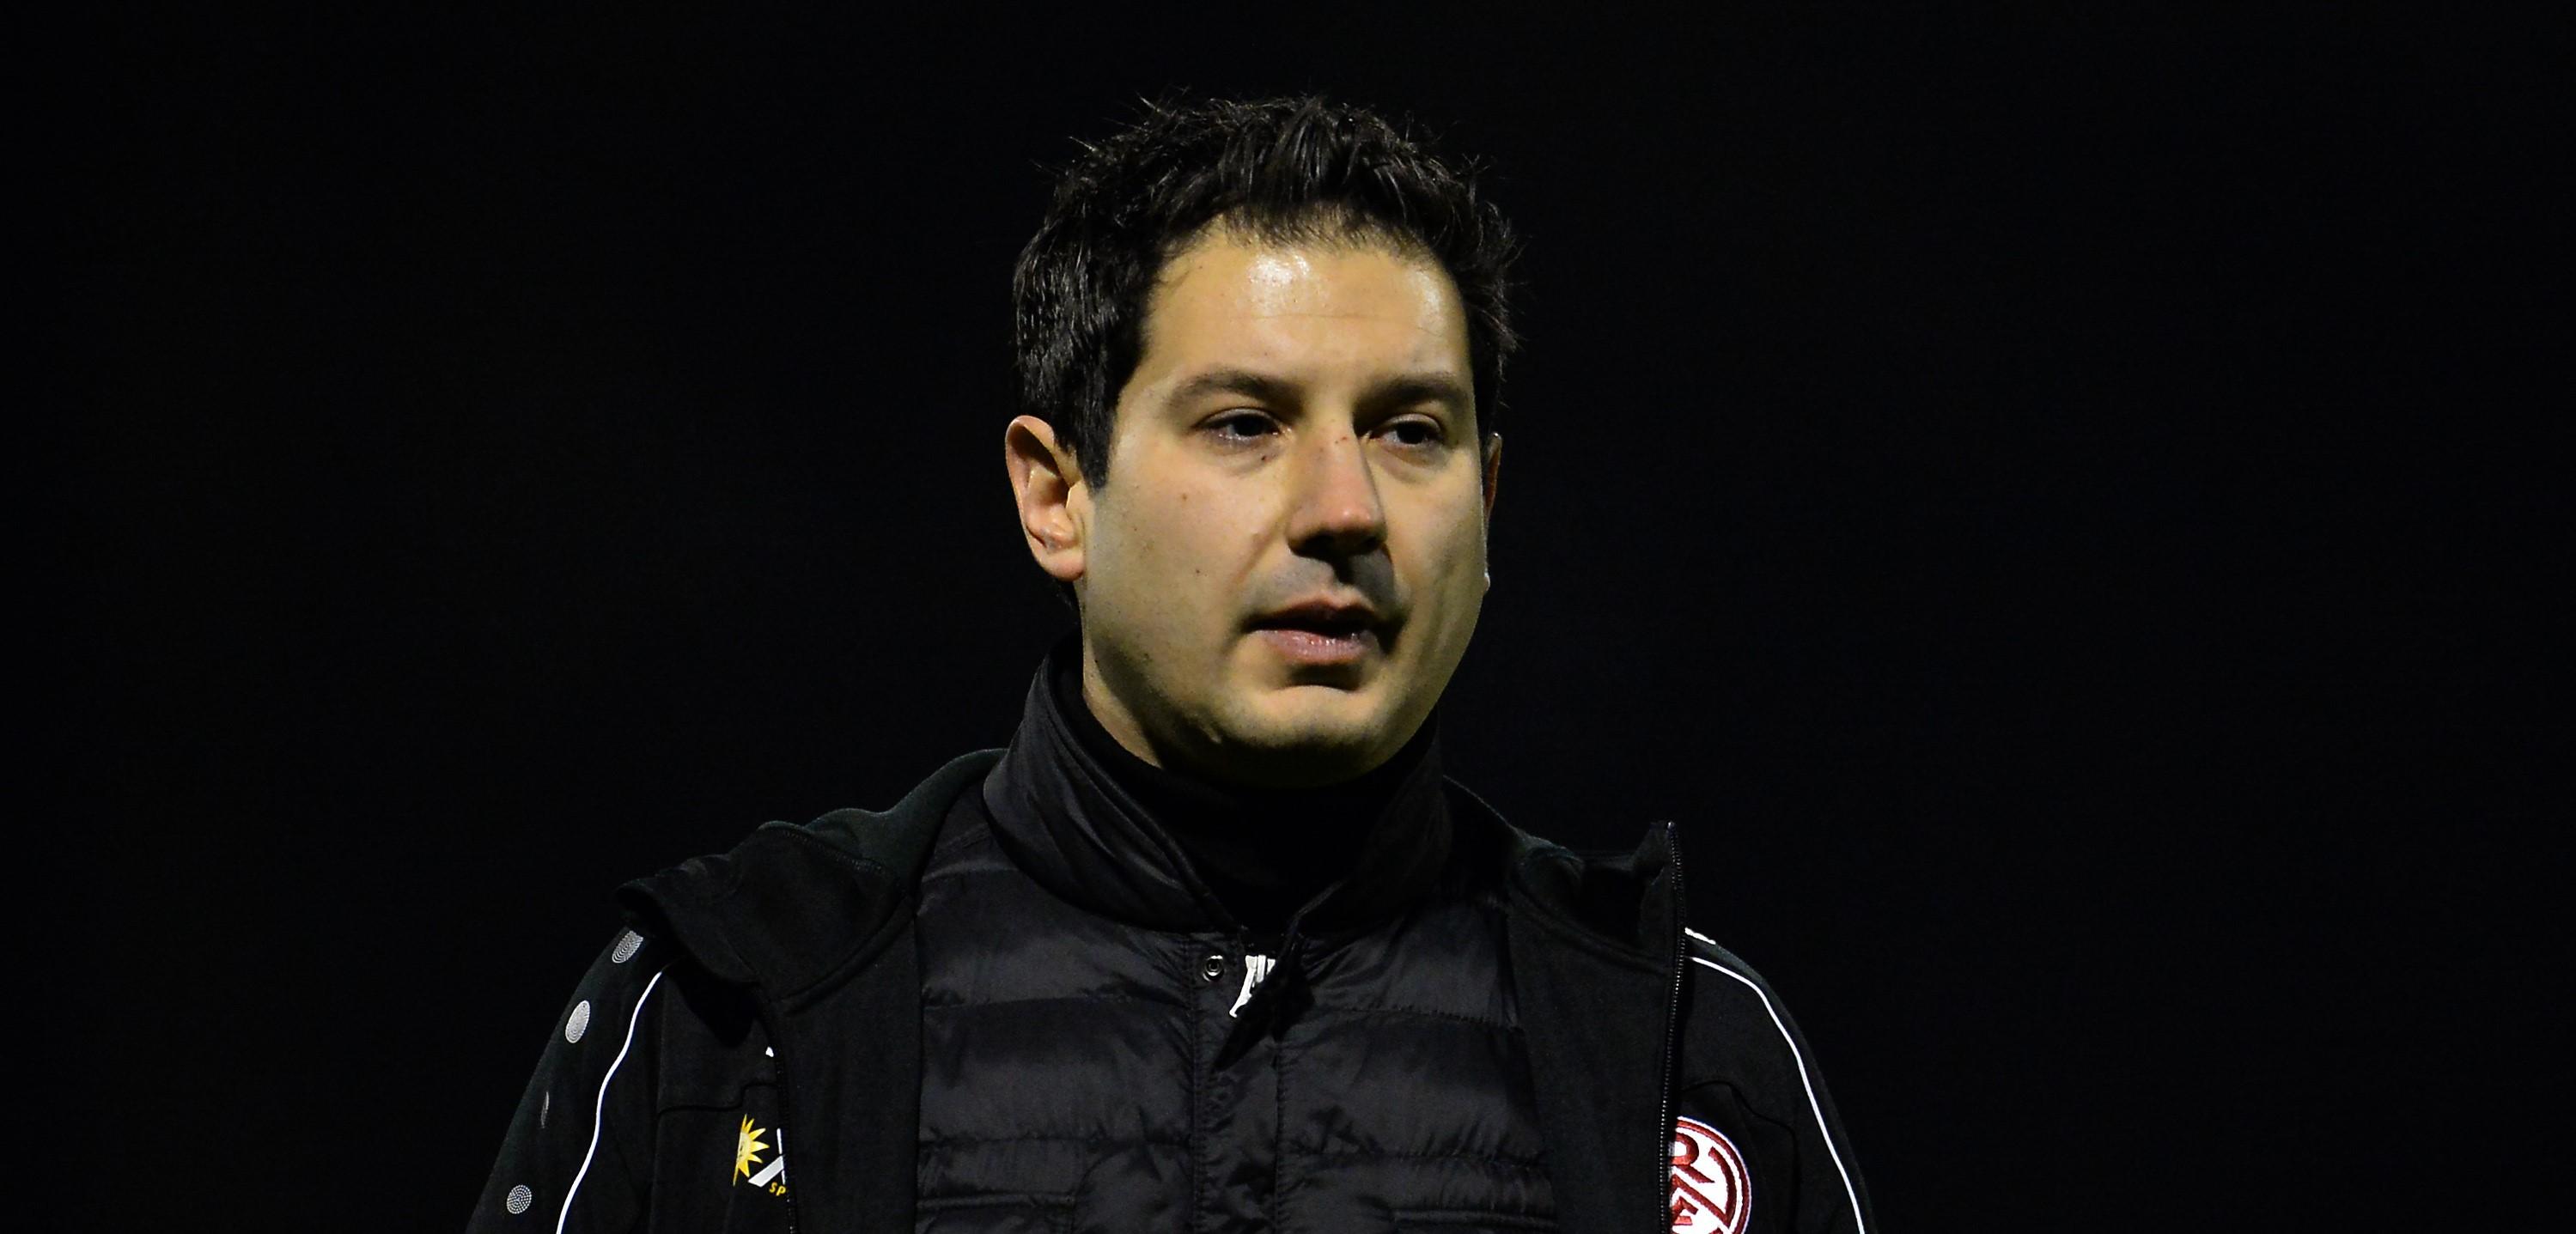 Argirios Giannikis verlässt Rot-Weiss Essen zum Saisonende. (Foto: Tillmann)